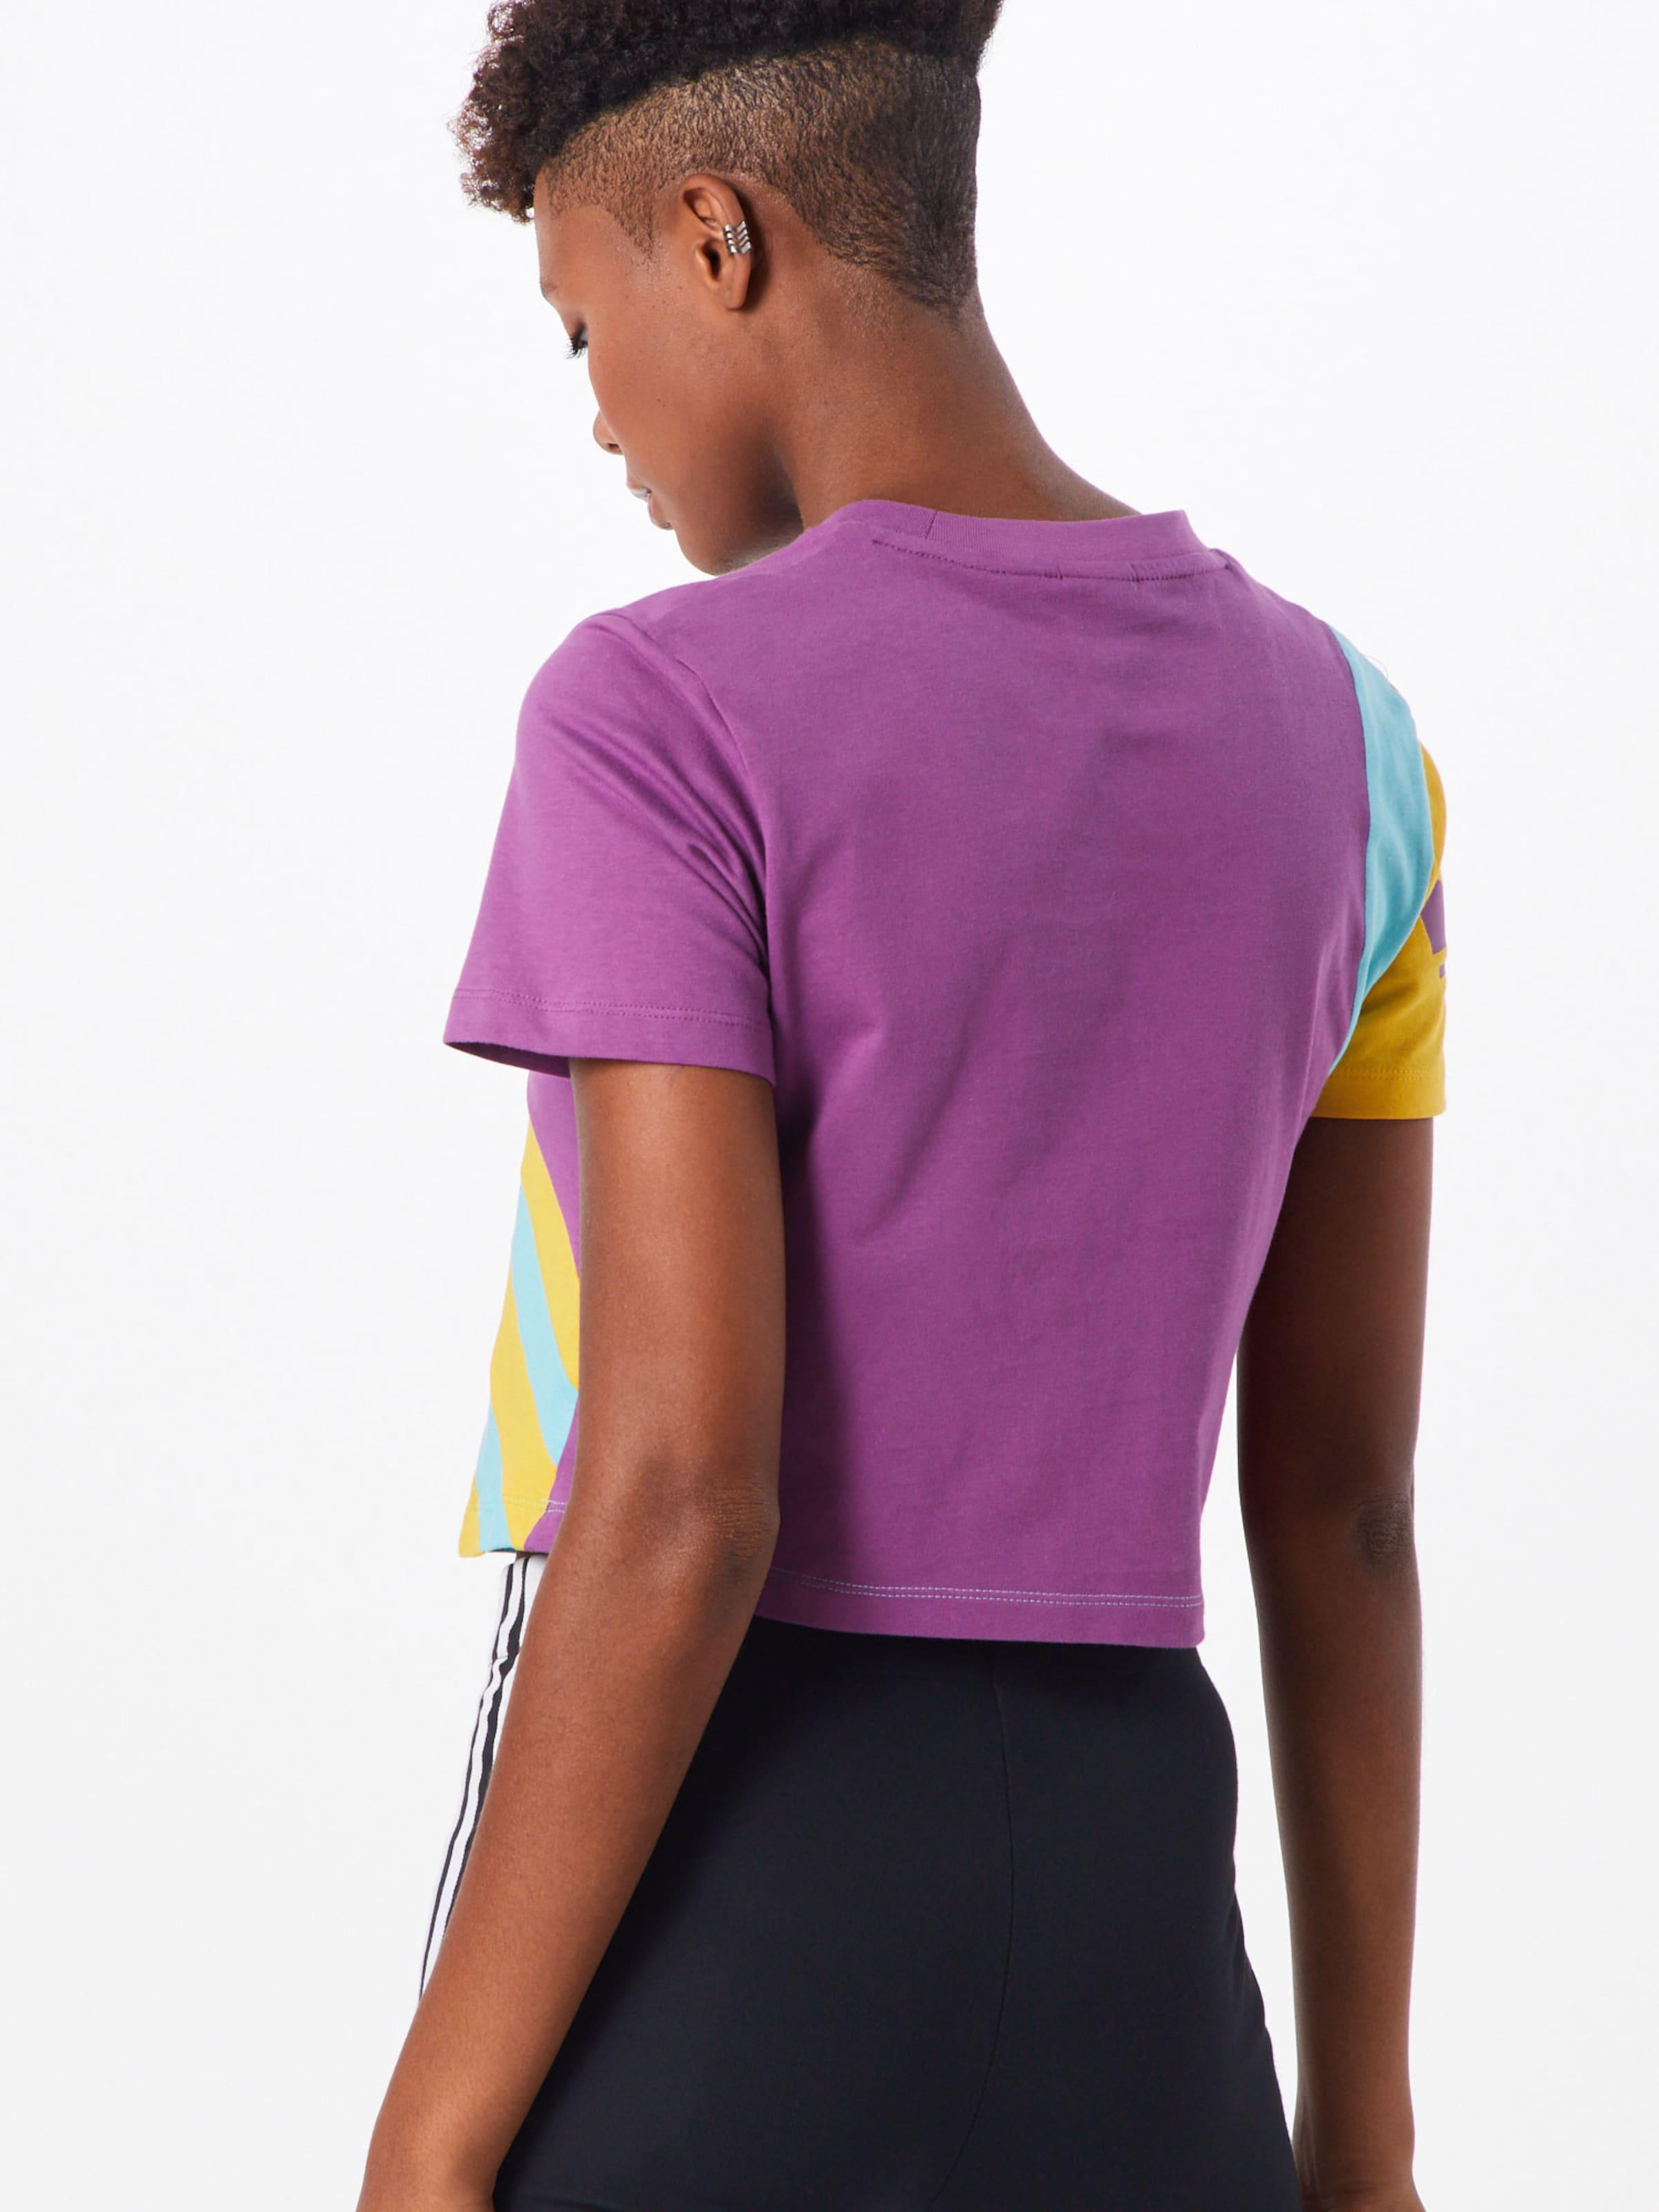 MintLila 'trefoil Tee' Adidas Originals Shirt In ZikXPu